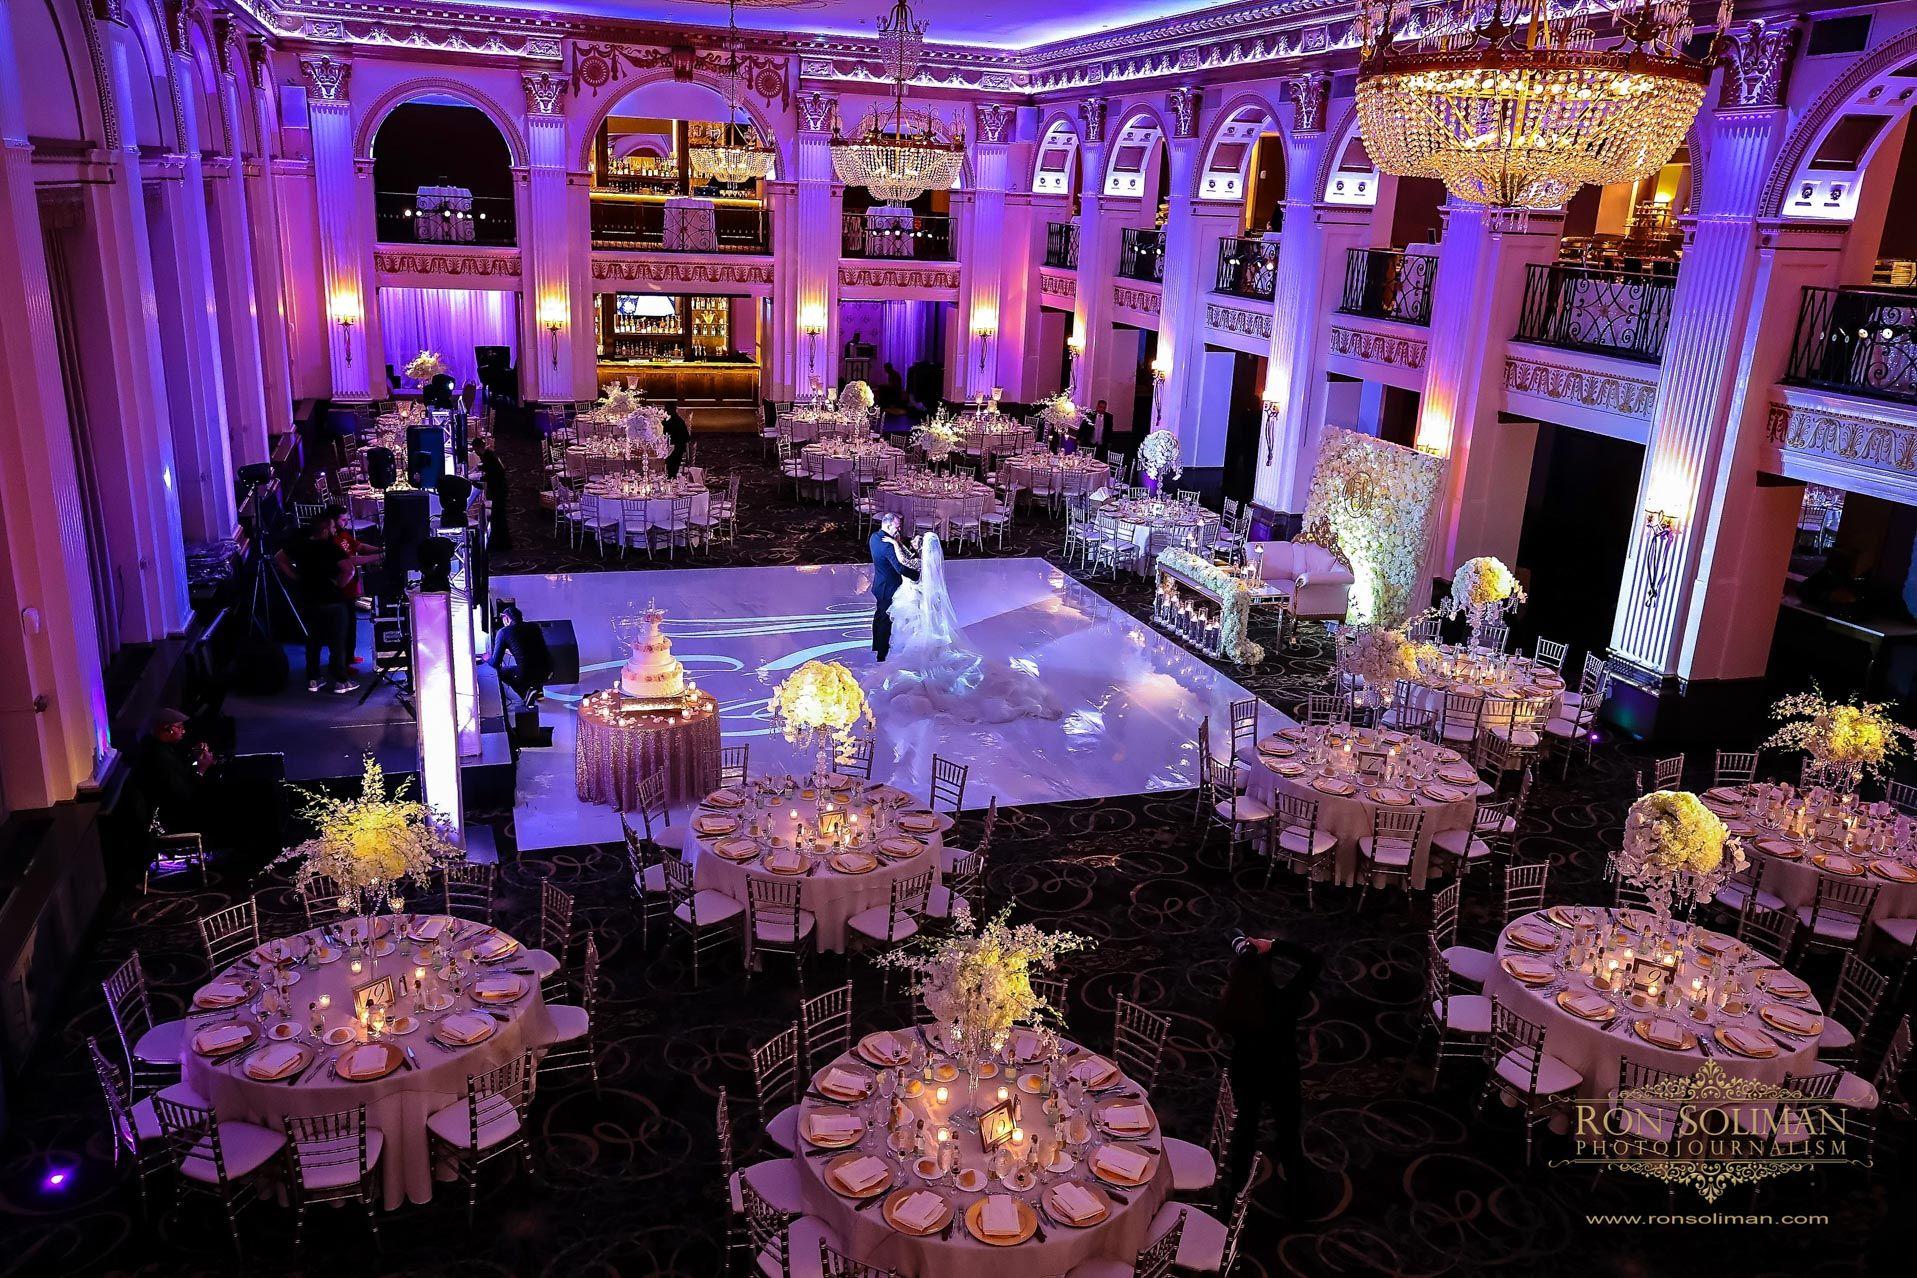 Dazzling Wedding Reception Uplight At Ballroom At The Ben As Documented By Wedding Table Decorations Diy Wedding Photographers Destination Wedding Photographer